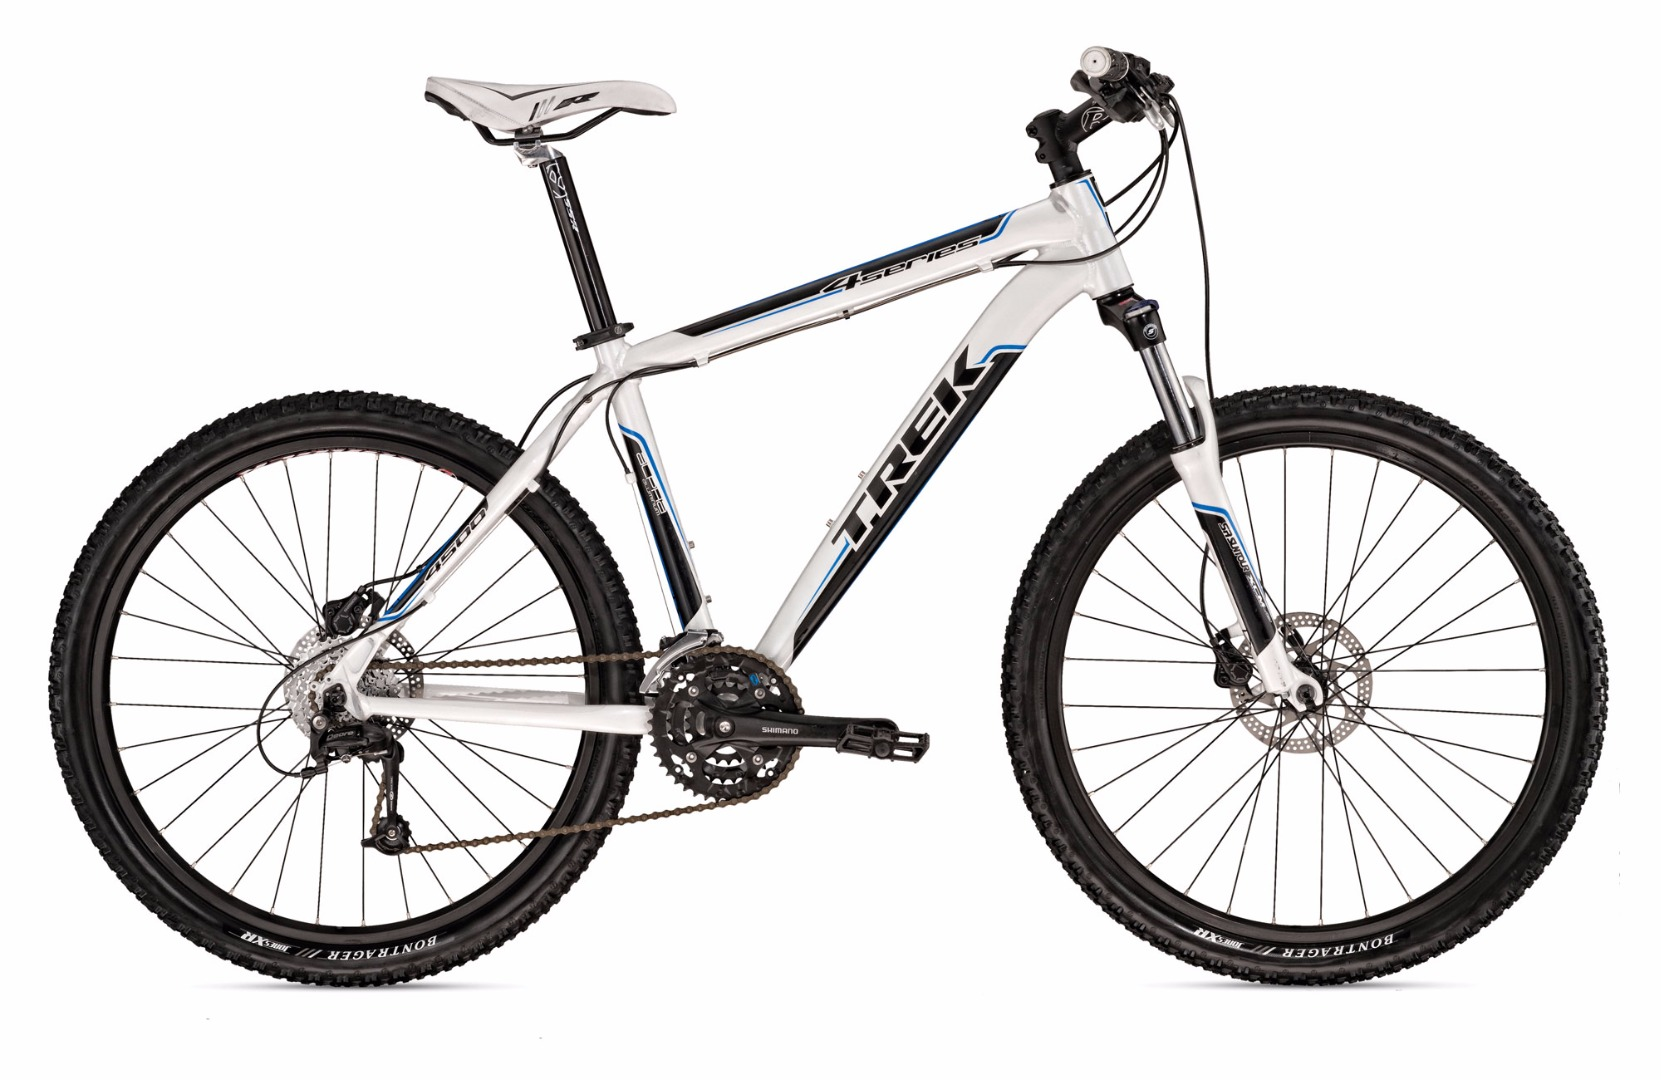 Stolen Trek 4 Series Mountain Bike